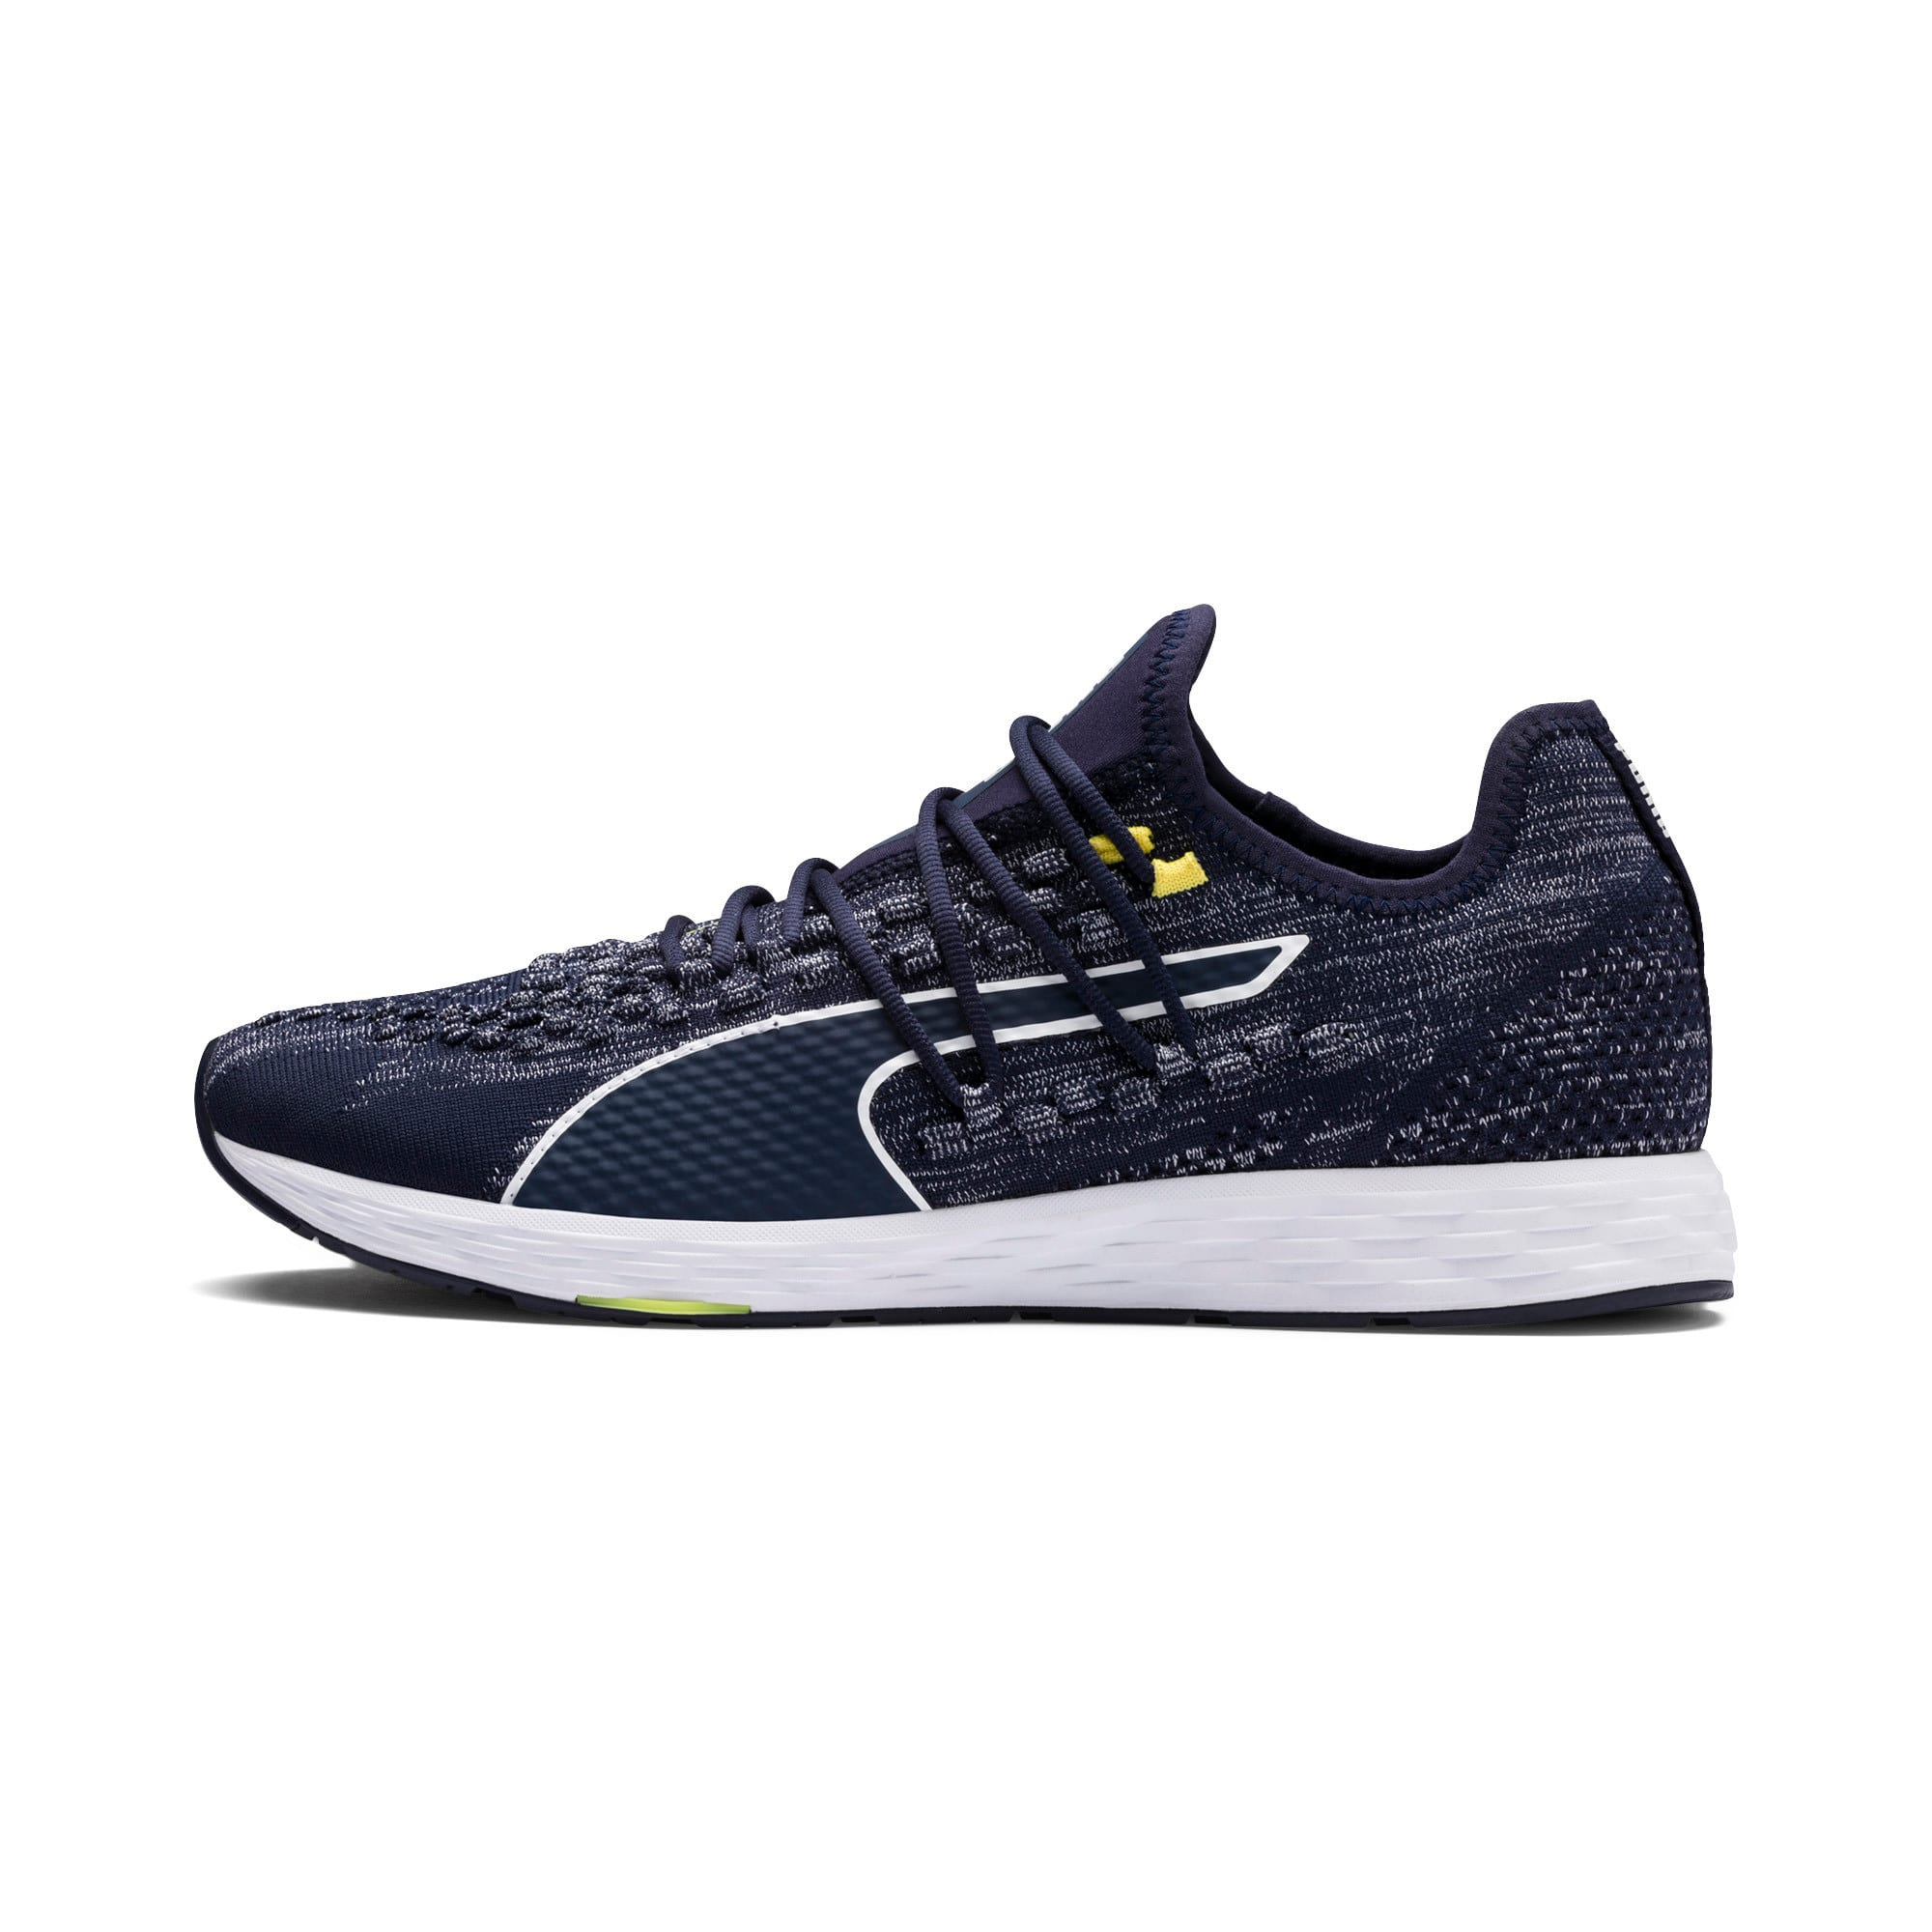 Thumbnail 1 of SPEED RACER Men's Running Shoes, Peacoat-White-Blazing Yellow, medium-IND